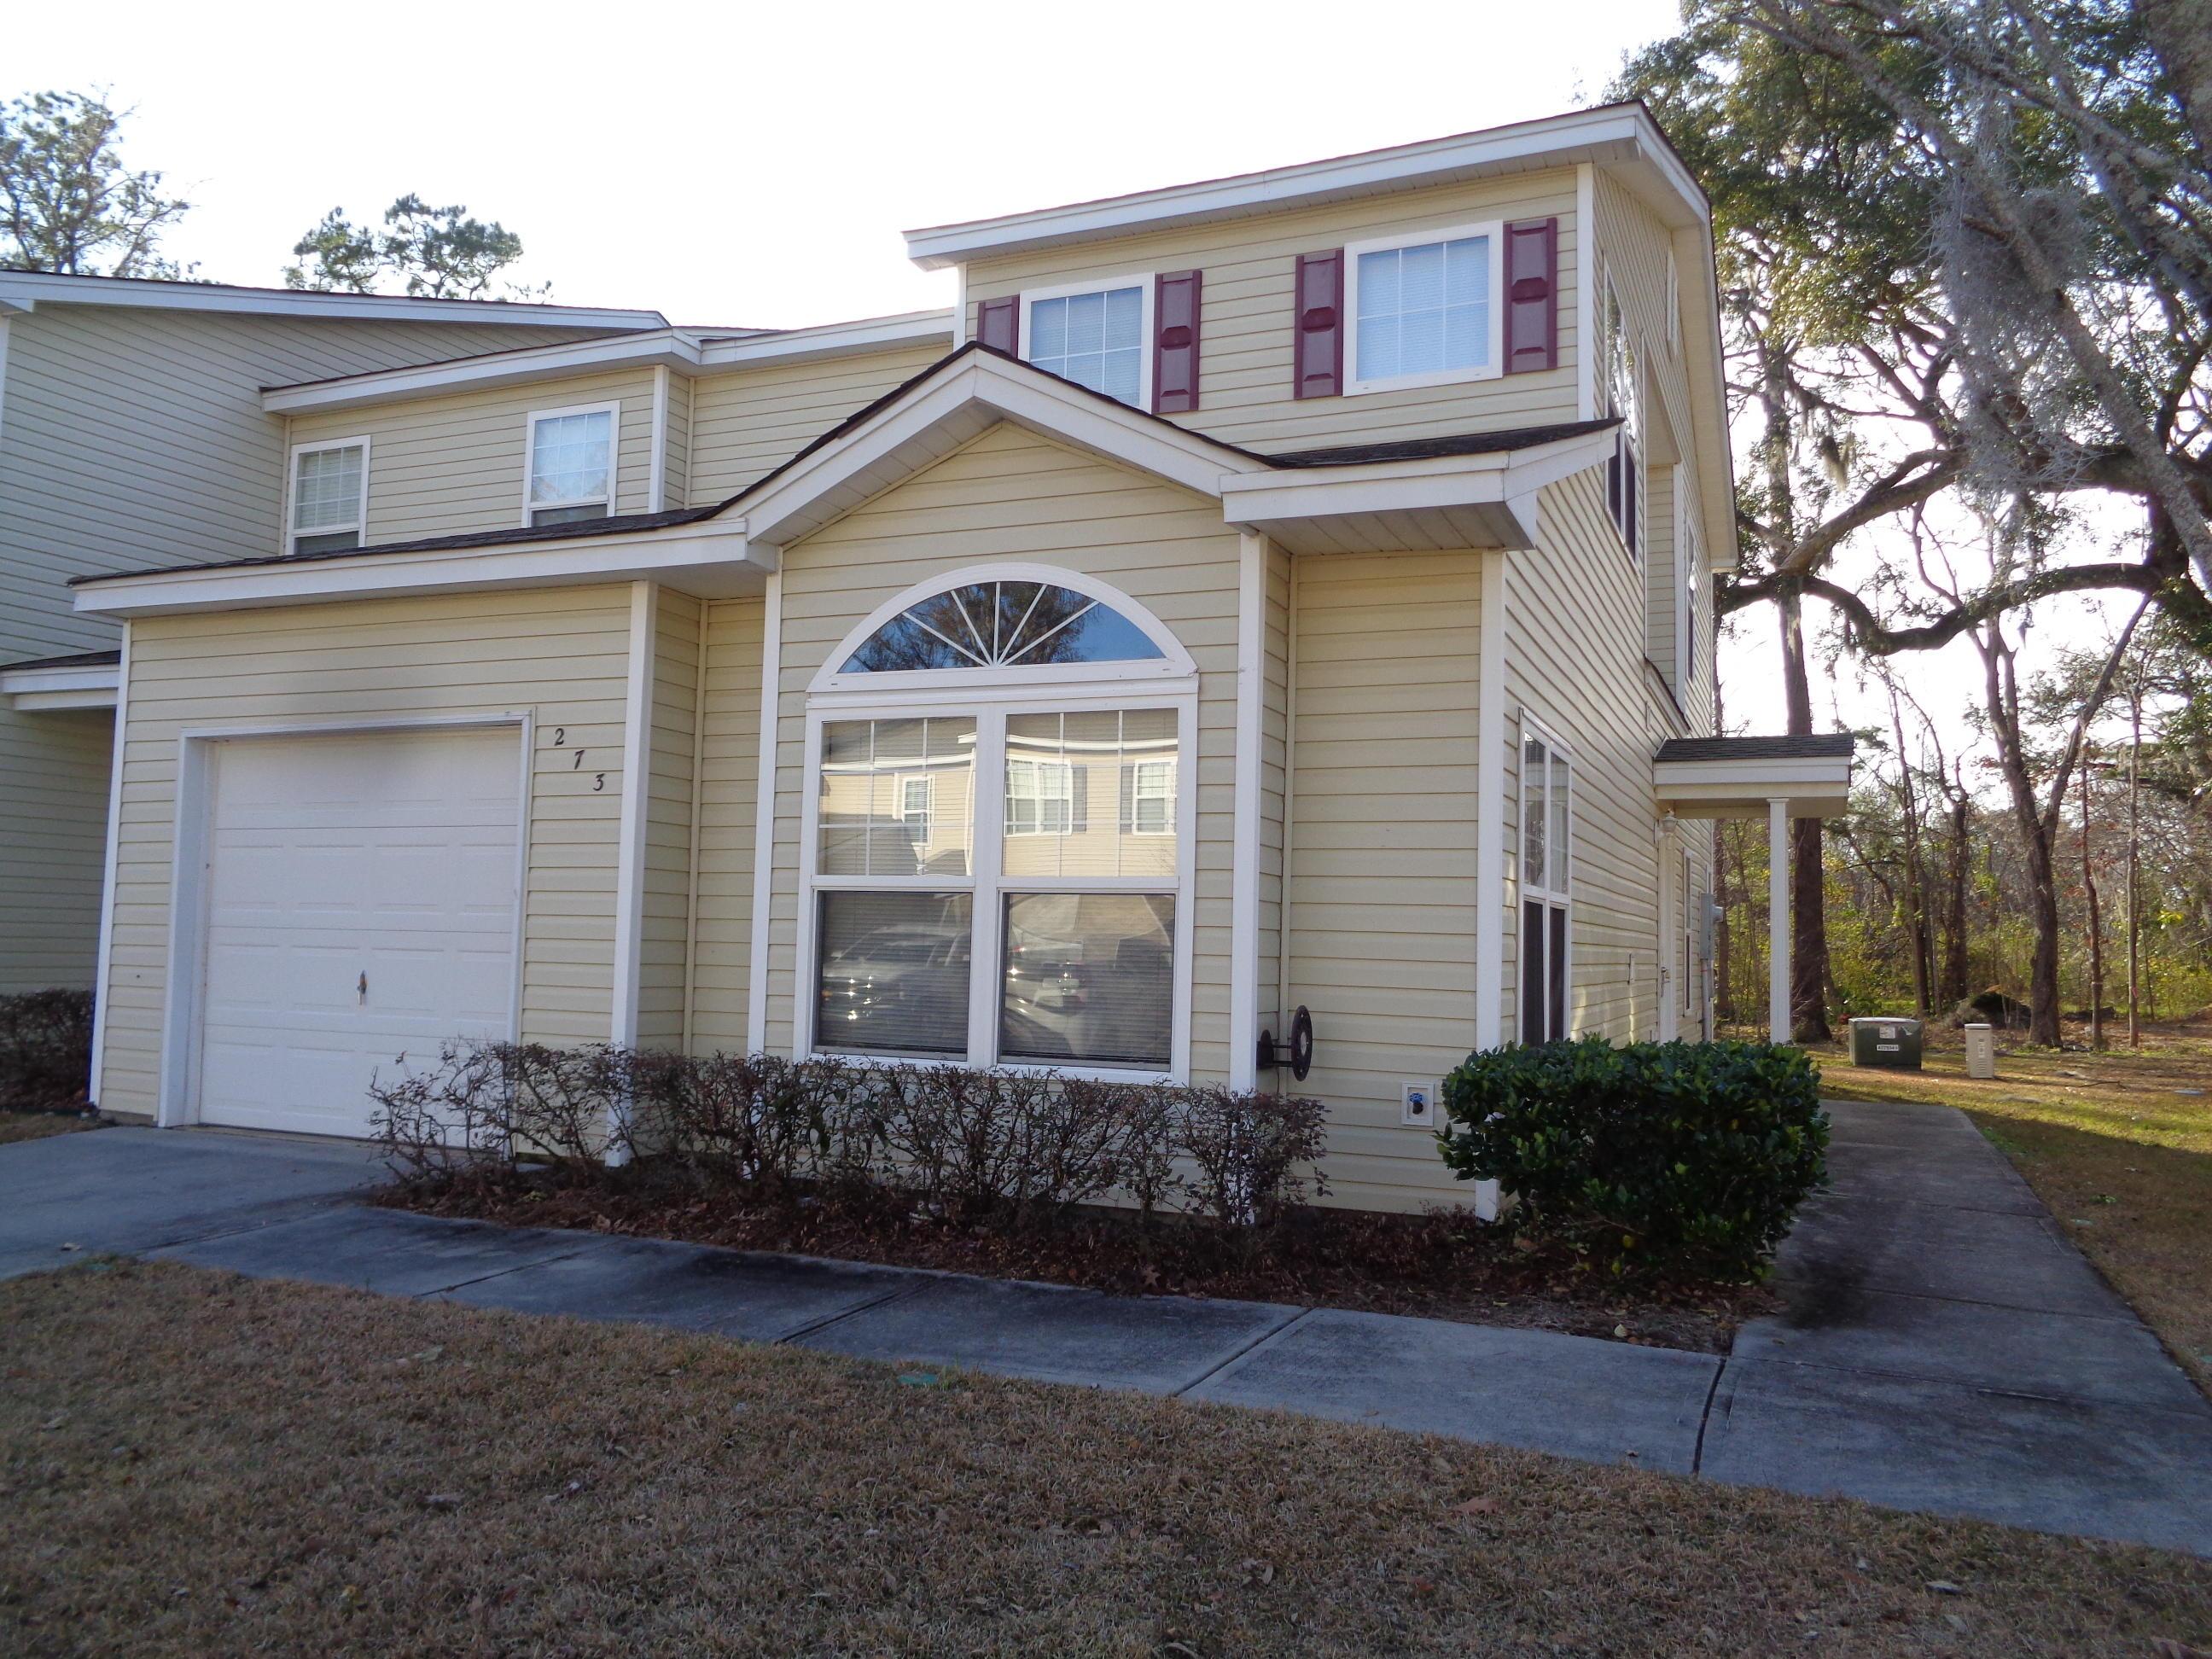 273 Grand Oaks Drive Ladson, SC 29456